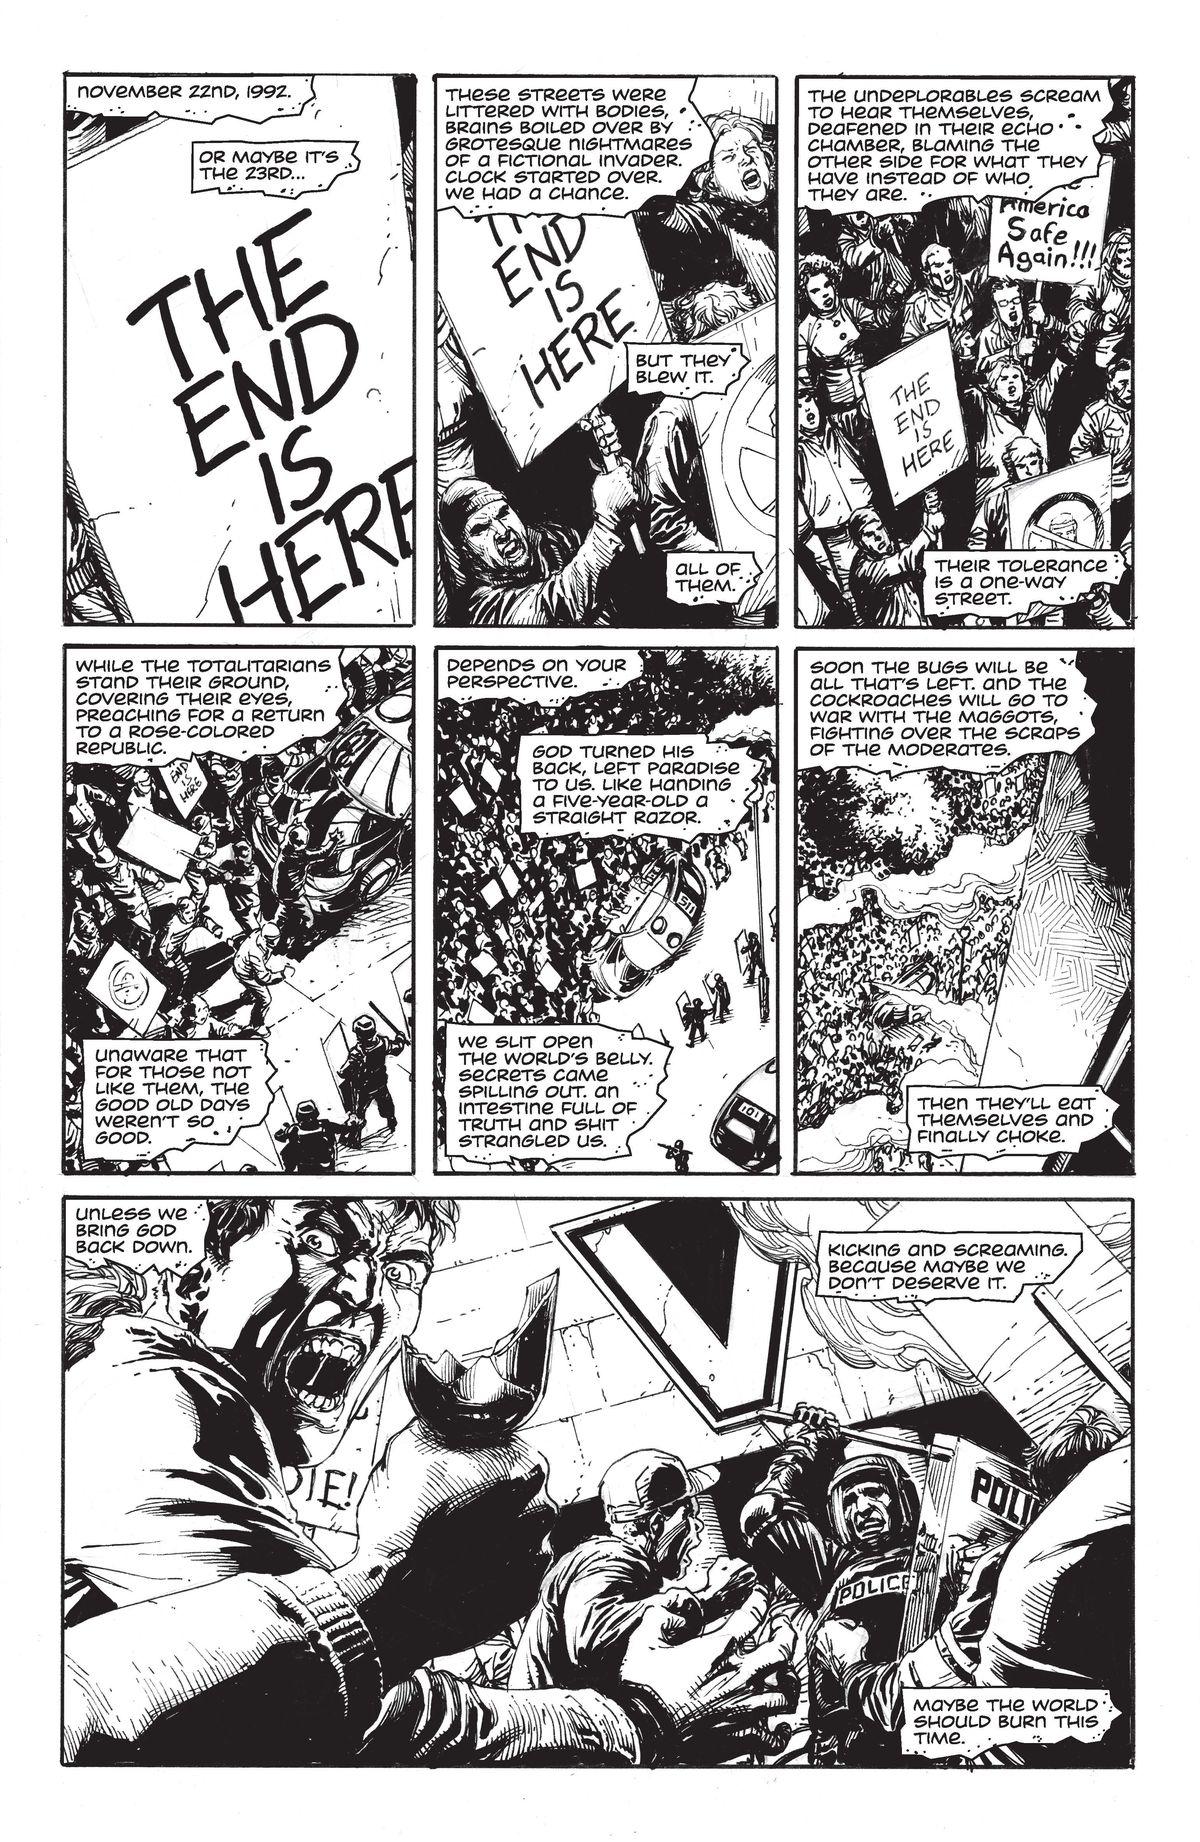 DC Comics' Doomsday Clock #1, page 1, written by Geoff Loeb, drawn by Gary Frank.